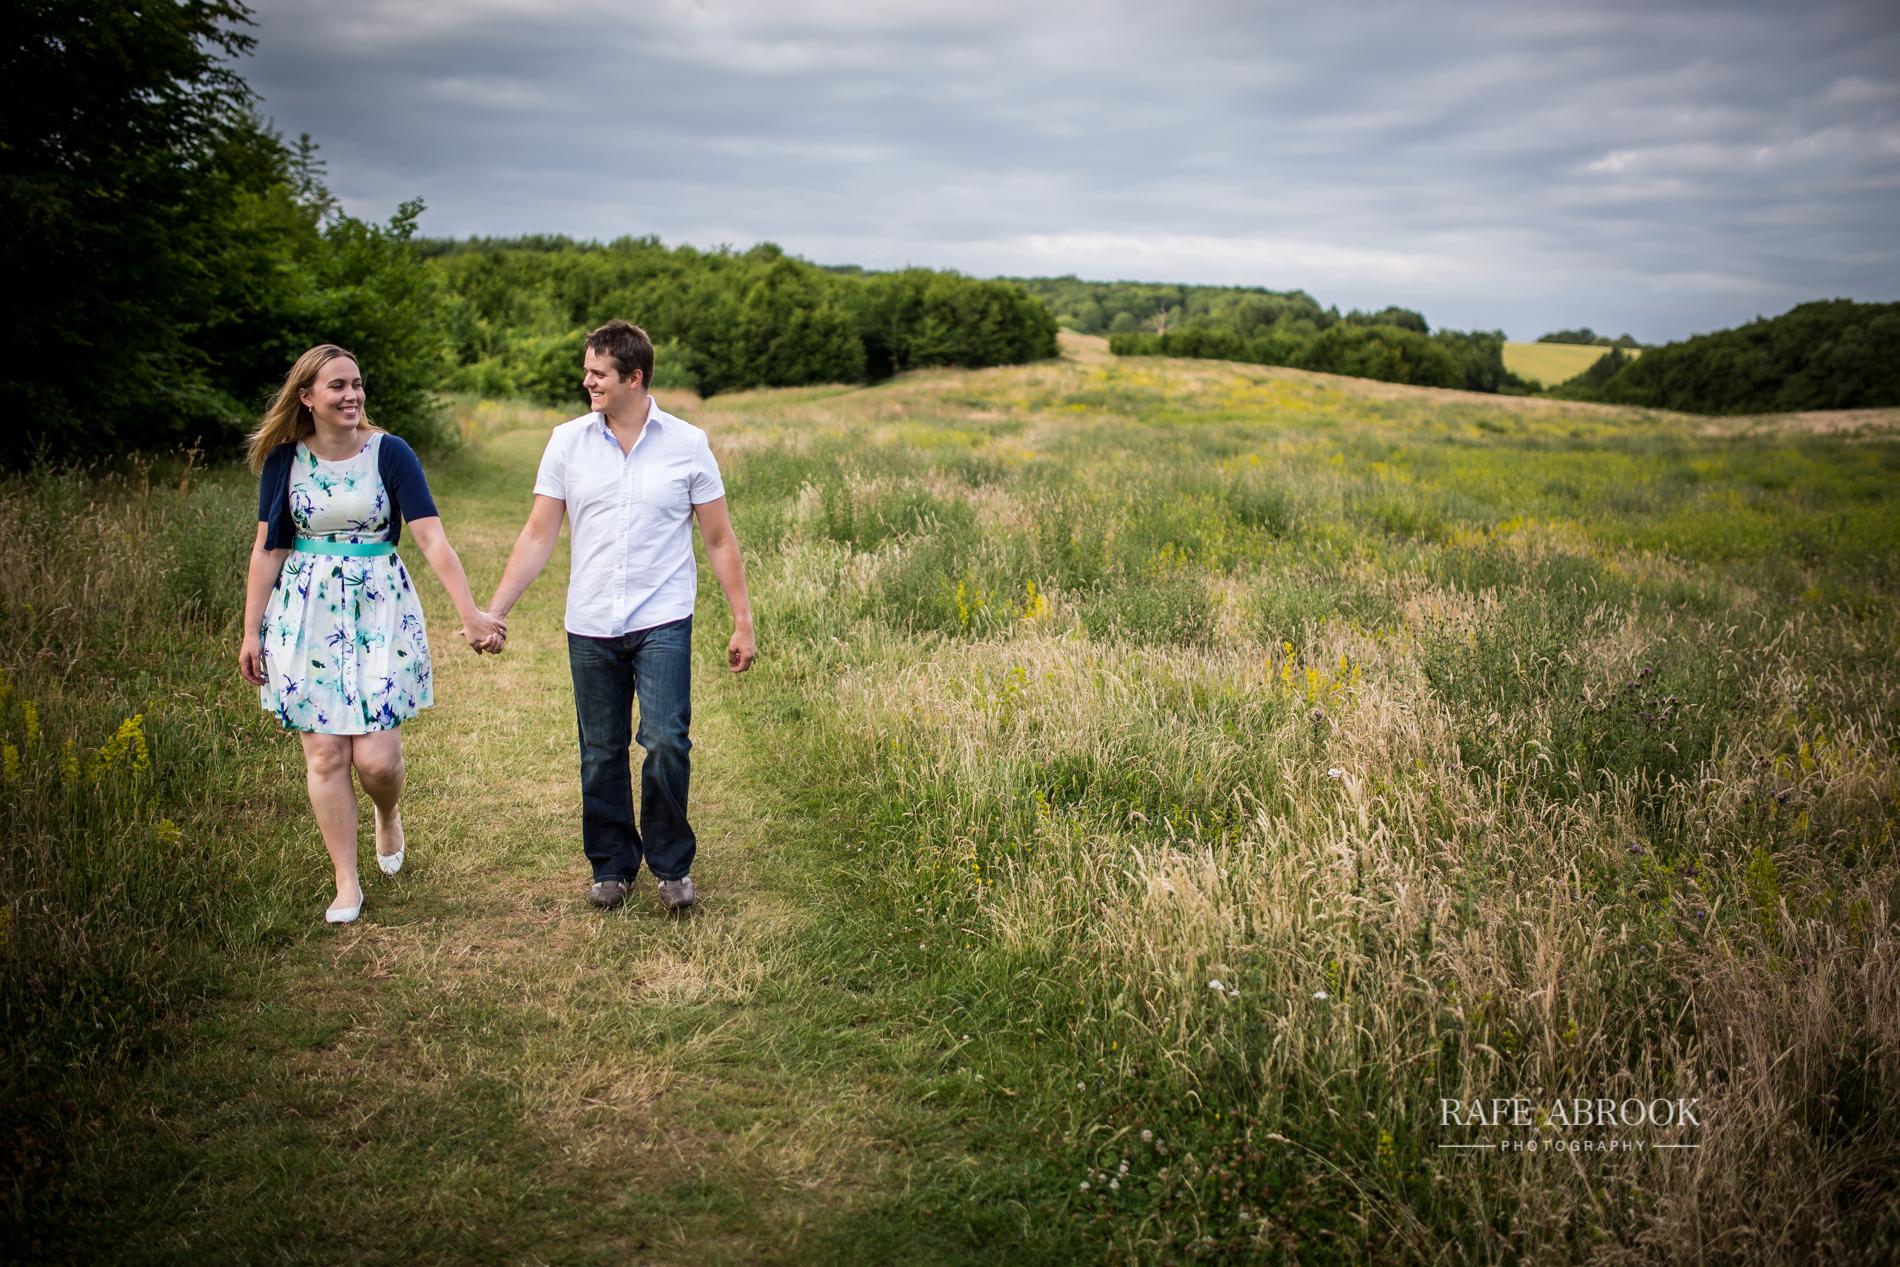 melanie & graham engagement shoot great ashby district park stevenage hertfordshire-1031.jpg